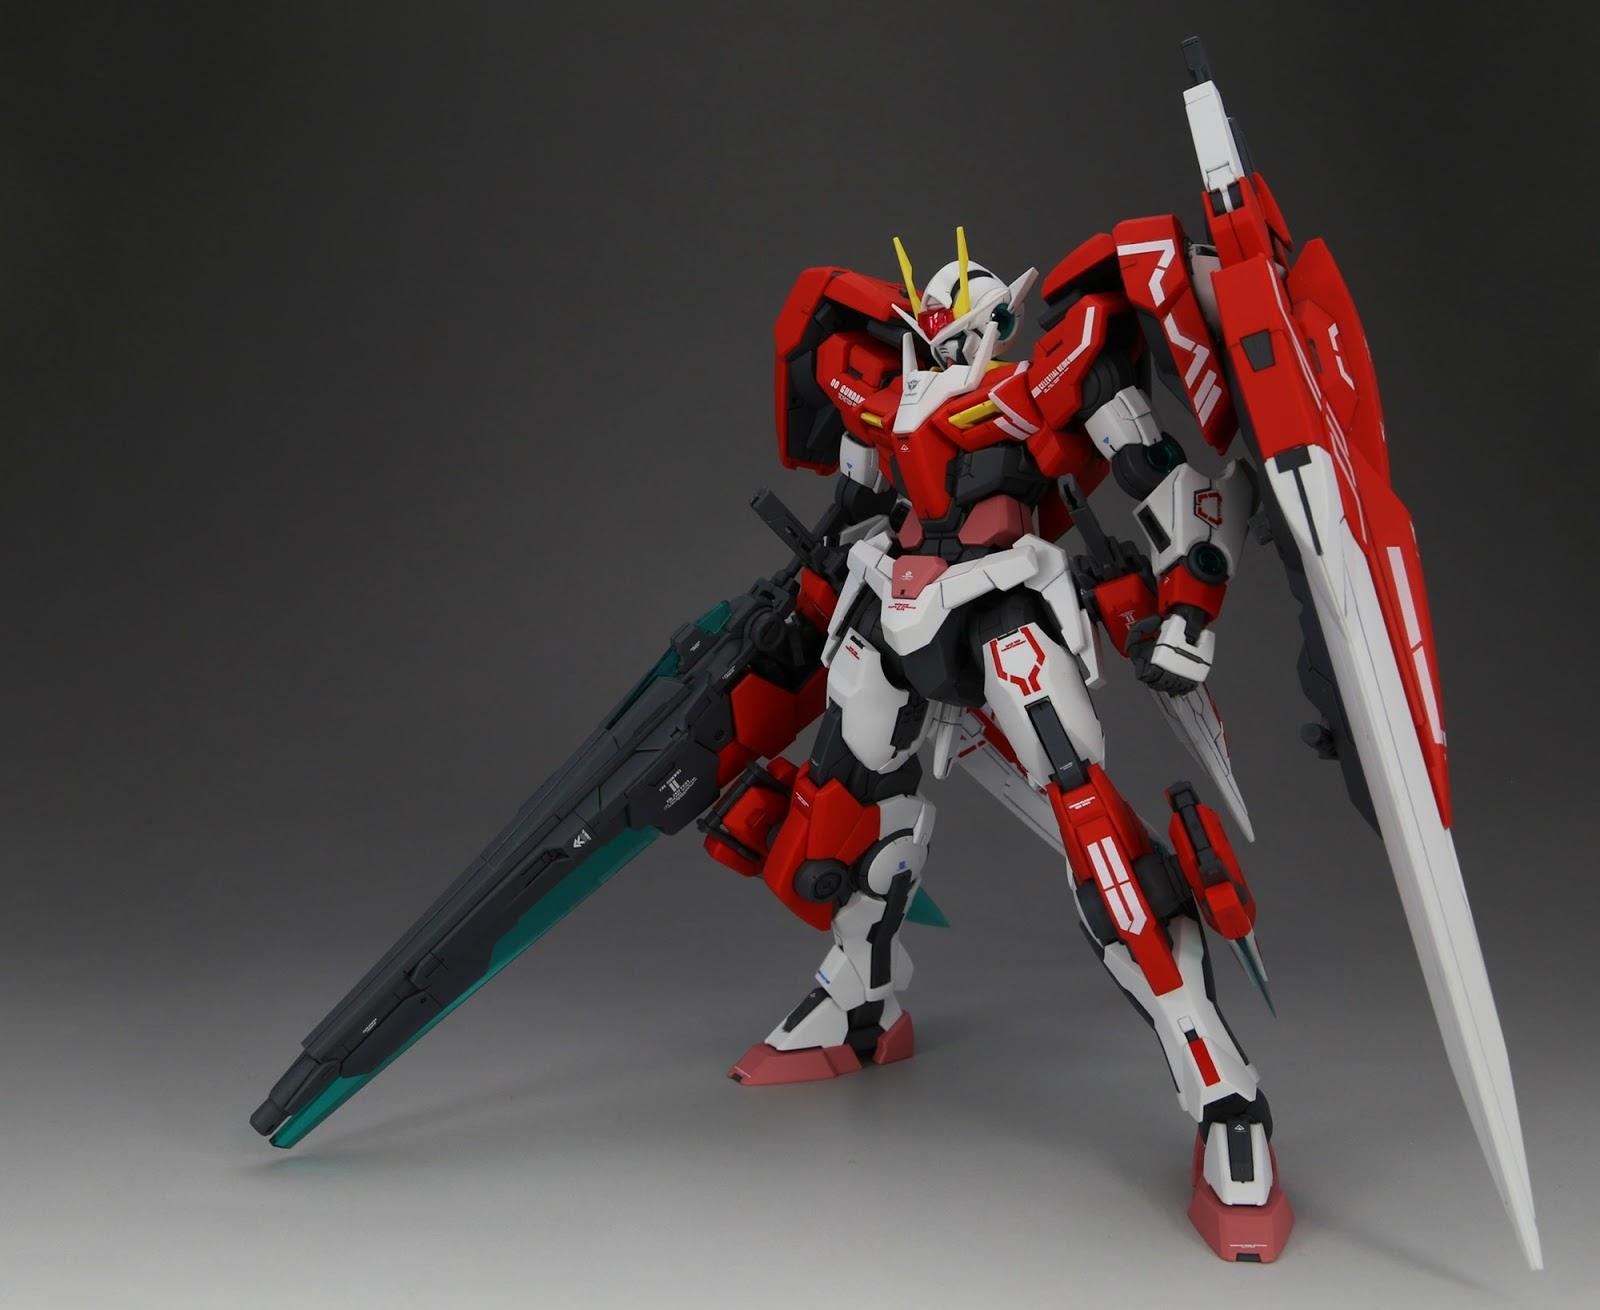 Gundam Family P Bandai Hobby Online Shop Exclusive Mg 1 100 00 Gundam Seven Sword G